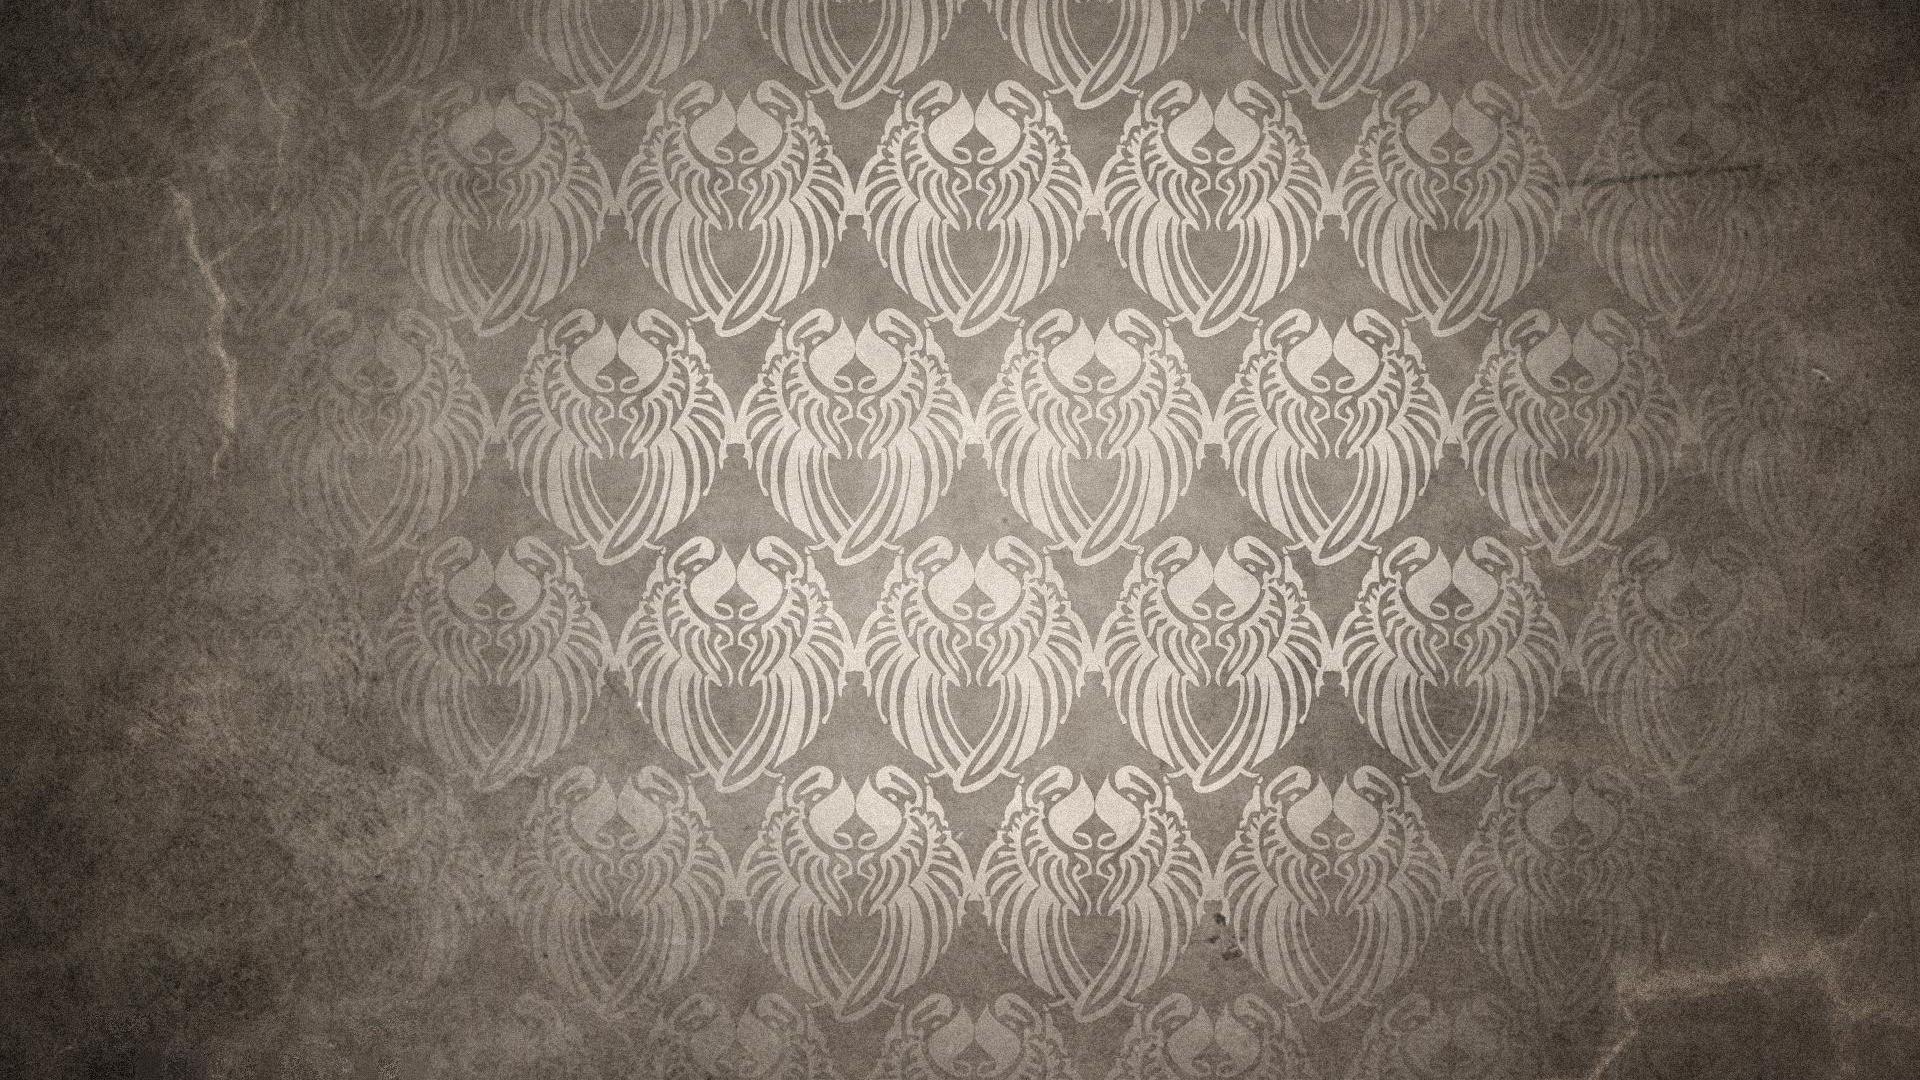 Vintage Patterns Wallpaper 19201080 Vintage Patterns Textures 1920x1080